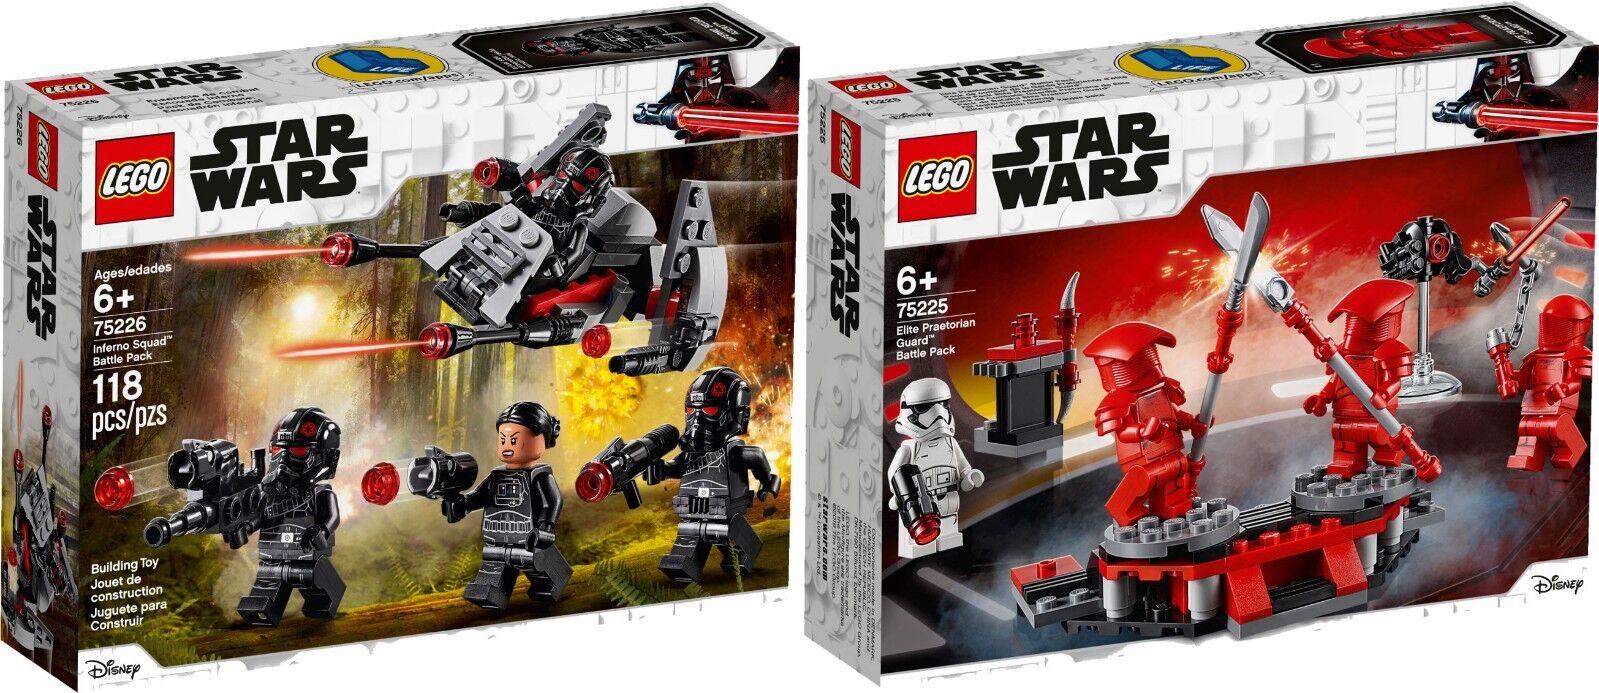 LEGO STAR WARS 75225 Elite Praetorian Guard Battle 75226 Inferno N1 19